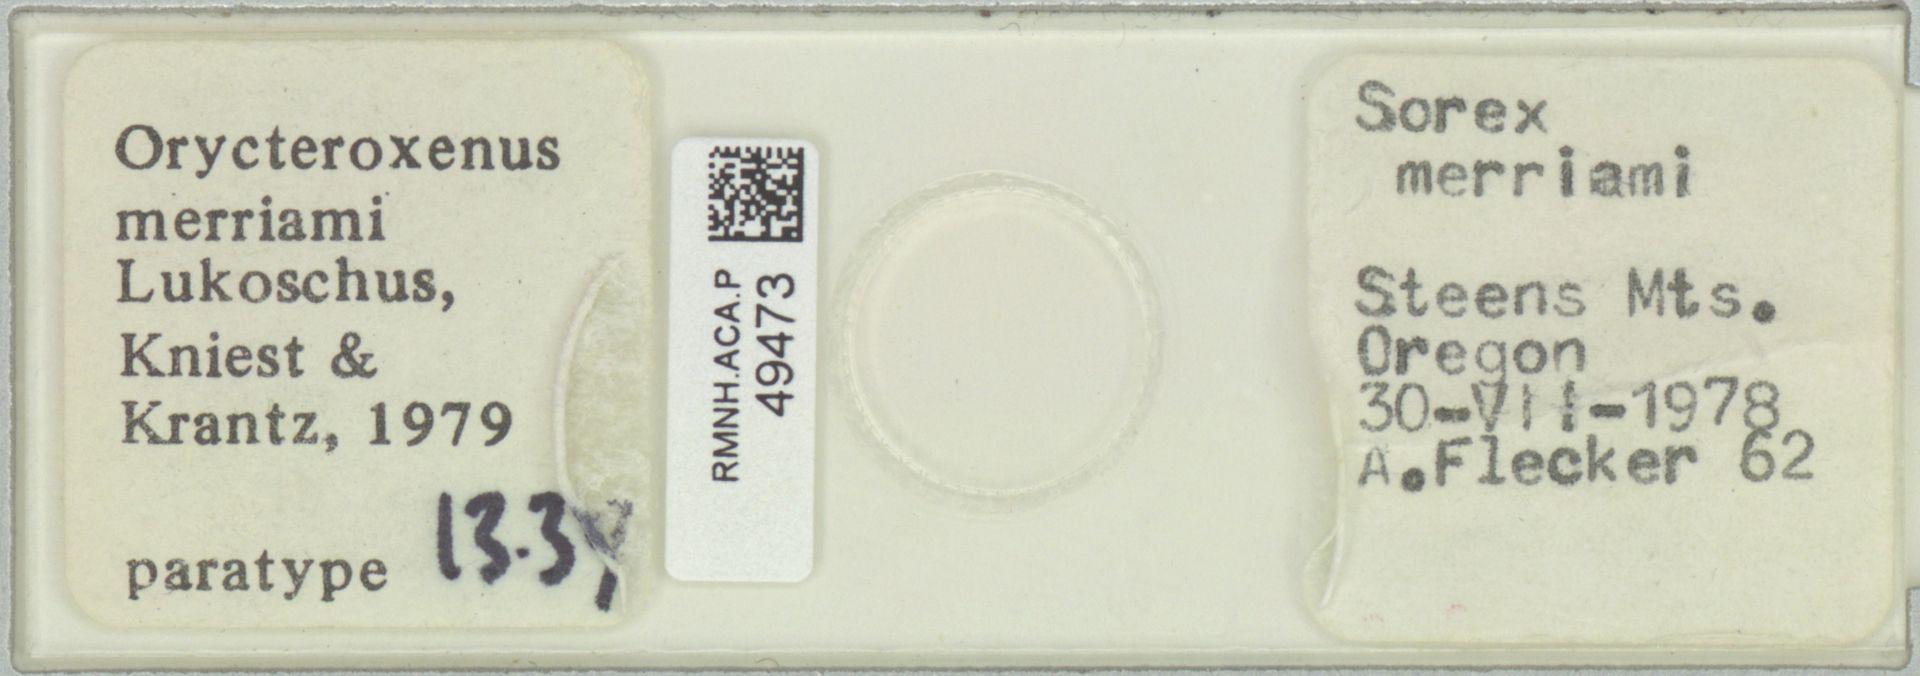 RMNH.ACA.P.49473 | Orycteroxenus merriami Lukoschus, Kniest & Krantz, 1979